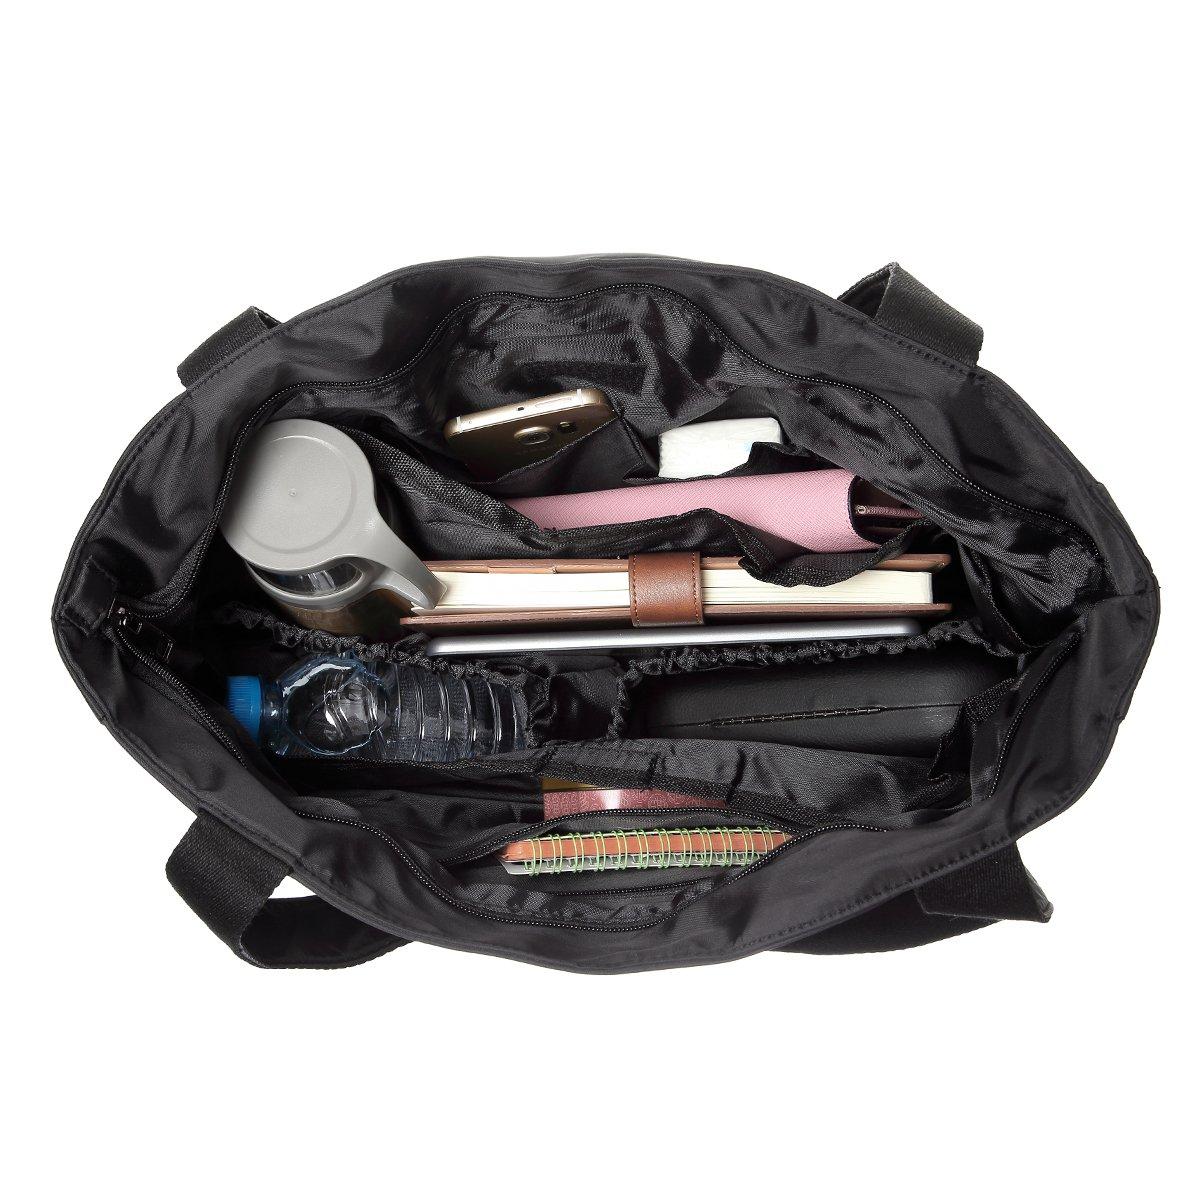 TENXITER Women Fashion Large Tote Shoulder Handbag Waterproof Tote Bag Multi-function Nylon Travel Shoulder (Black)